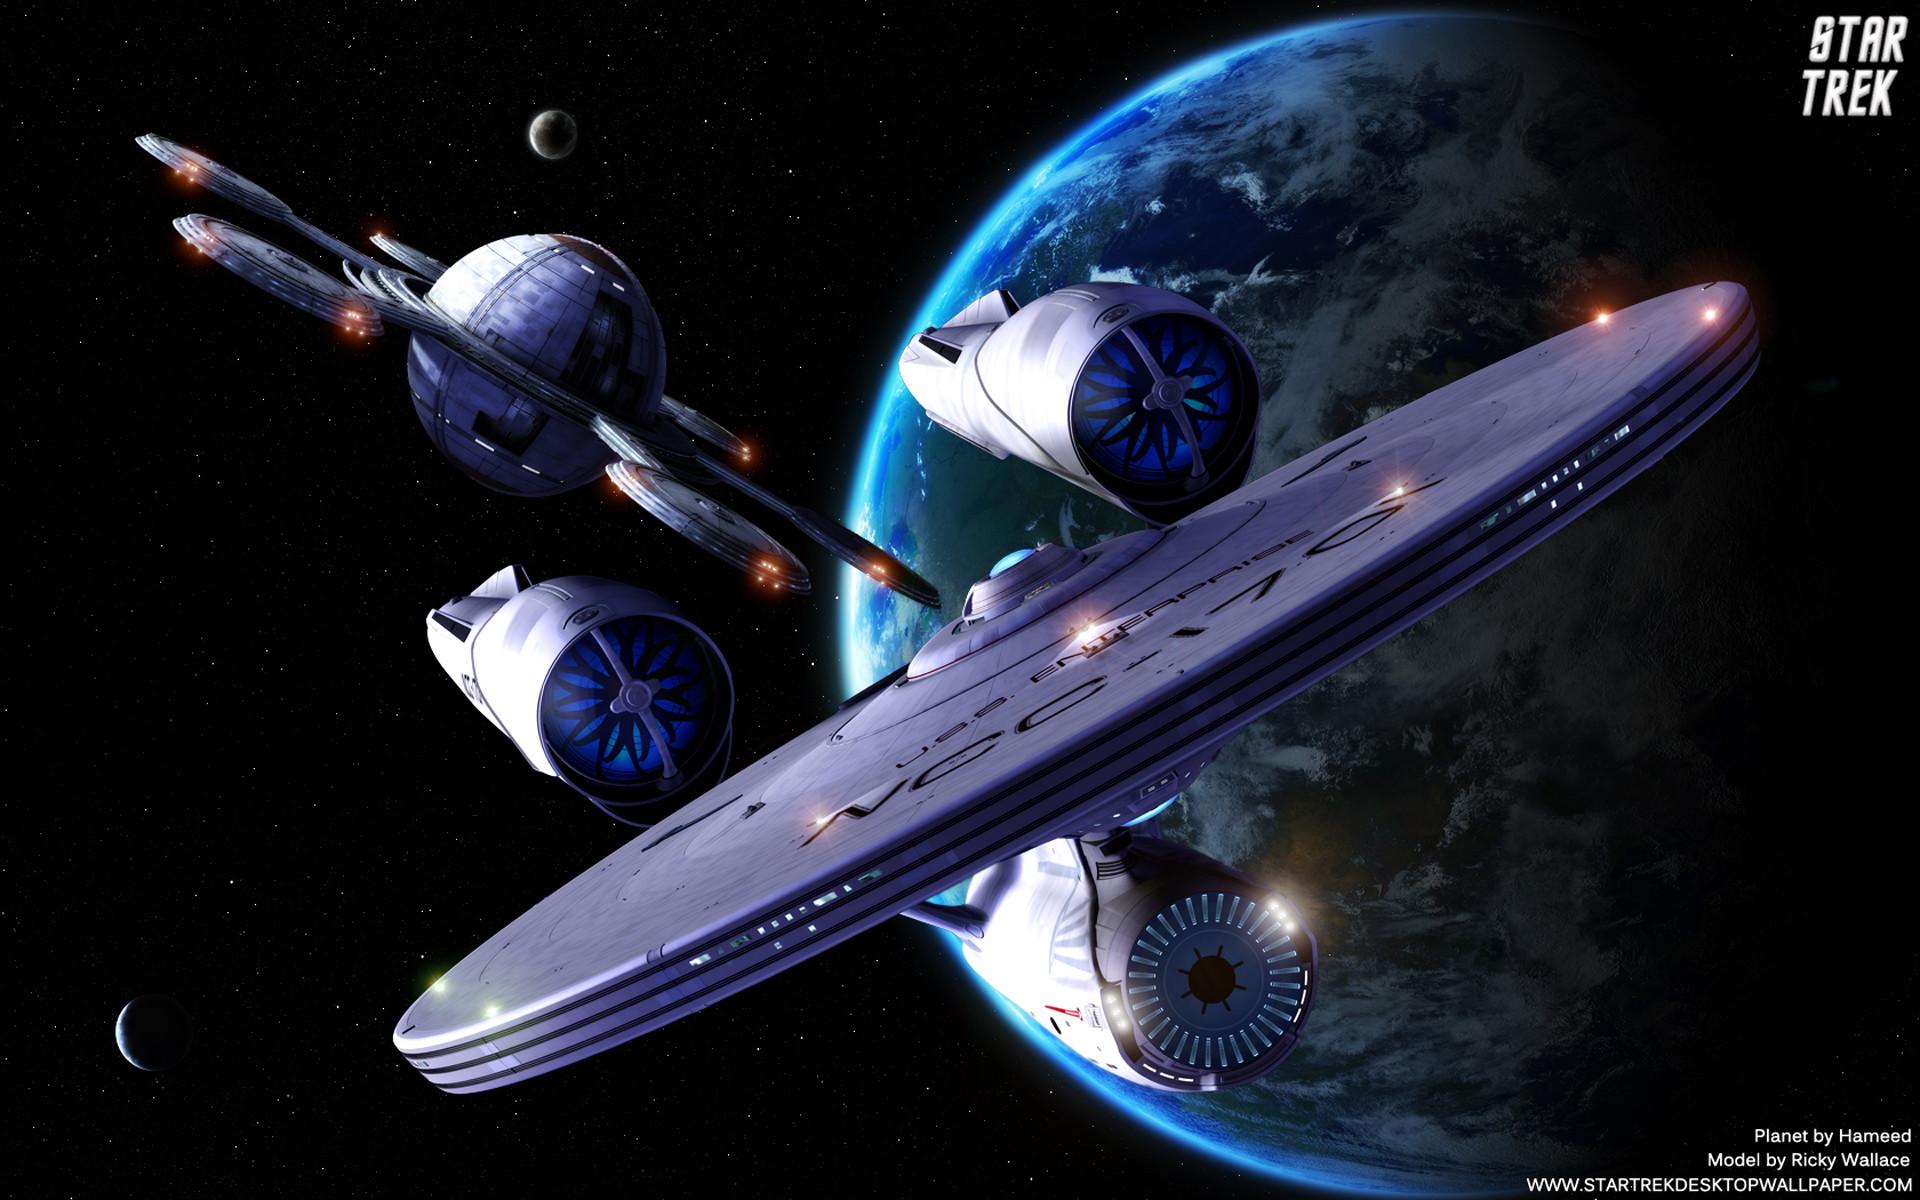 Star Trek USS Enterprise 1701 departing United Federation of Planets  Starbase. Free Star Trek computer